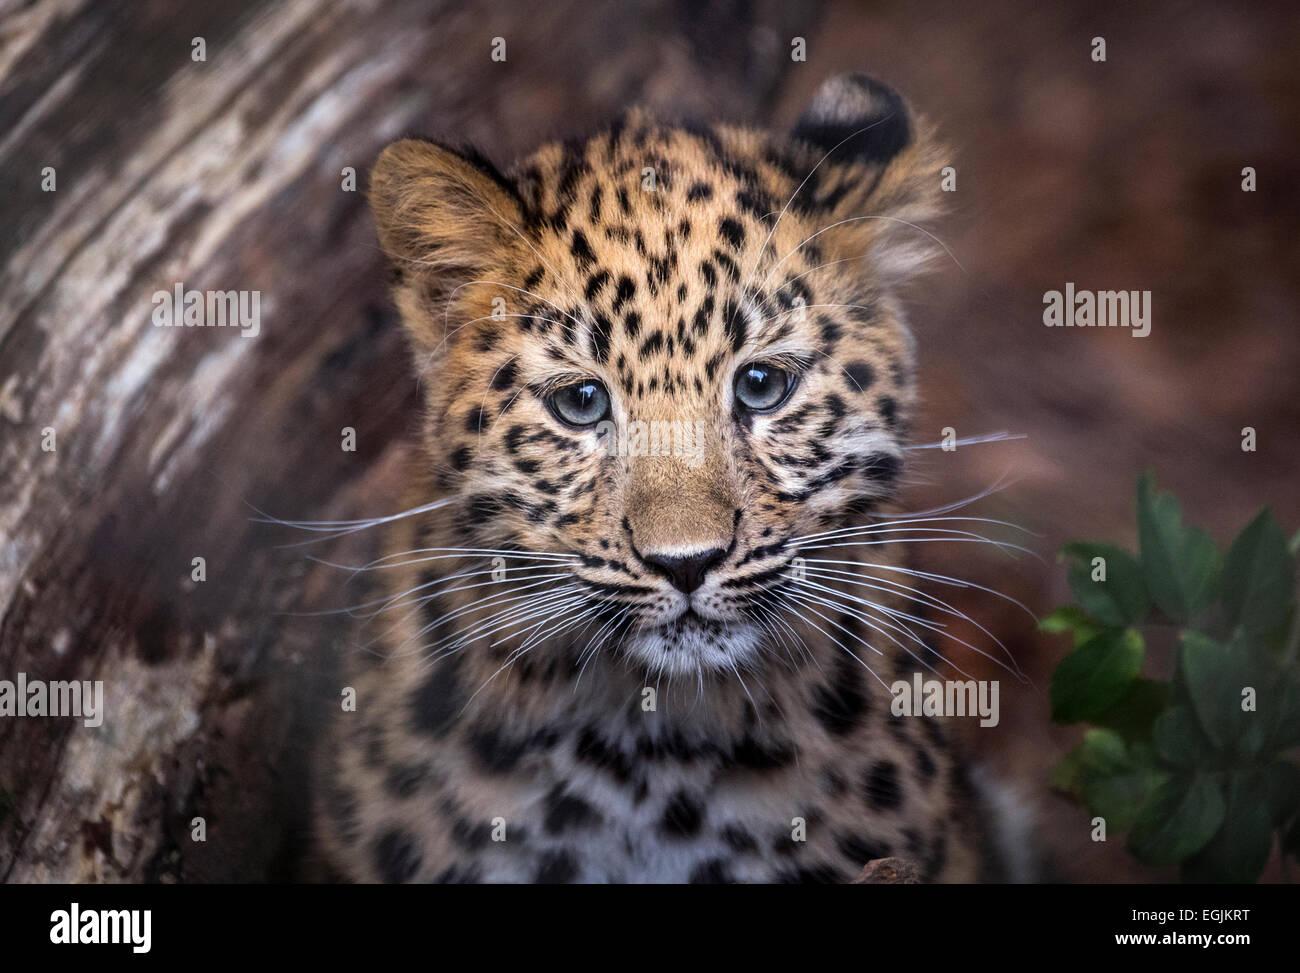 Female Amur leopard cub looking at camera - Stock Image